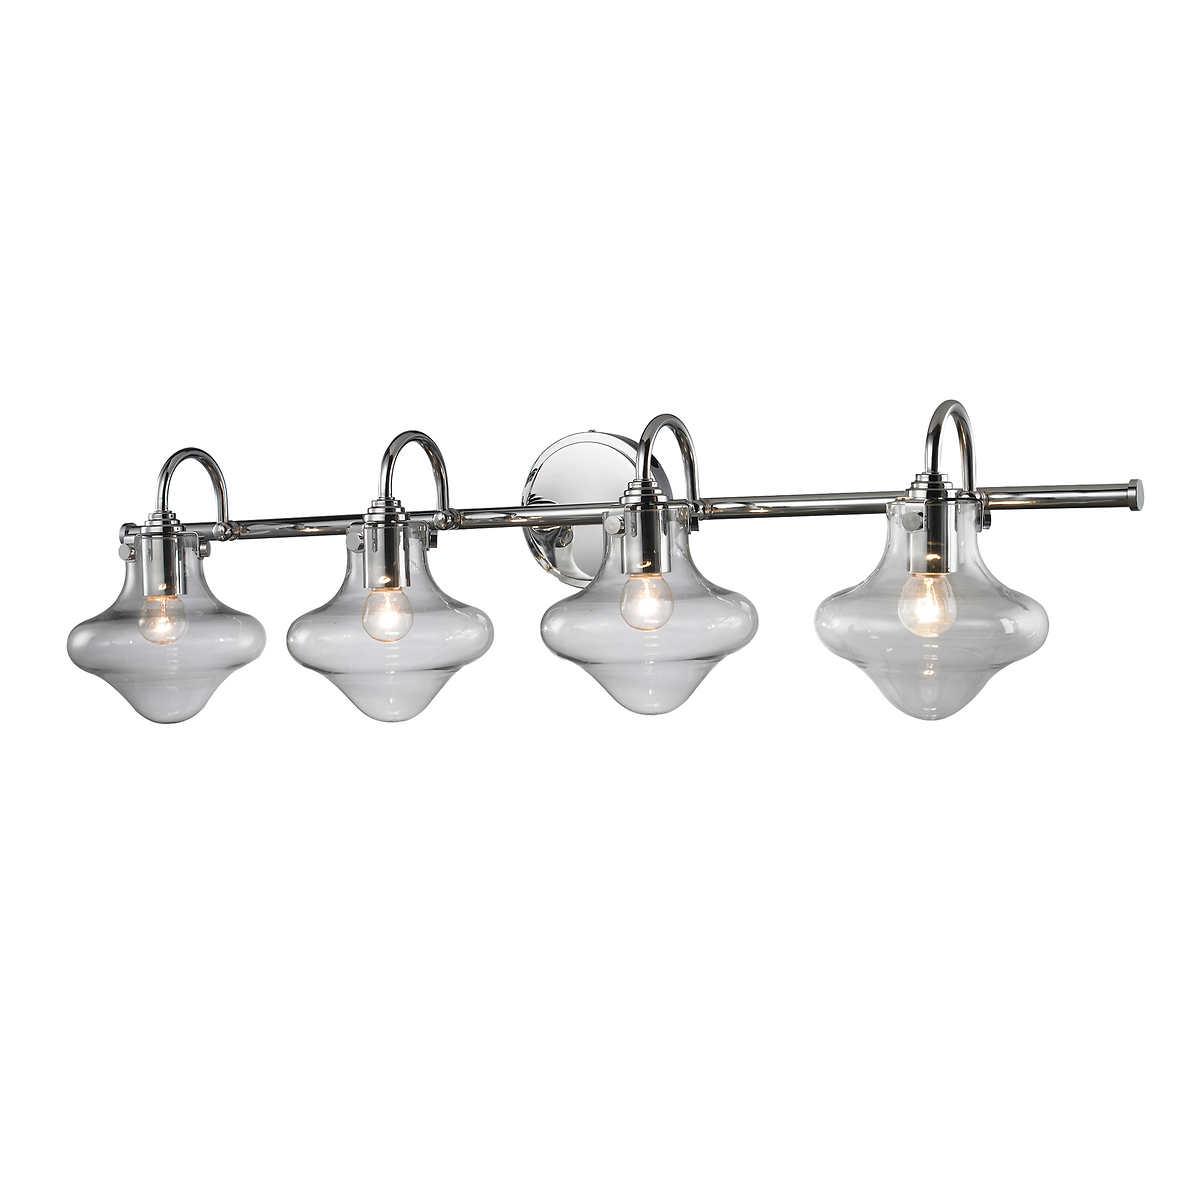 Costco bathroom lighting - L2 Lighting 4 Light Bath Vanity Light